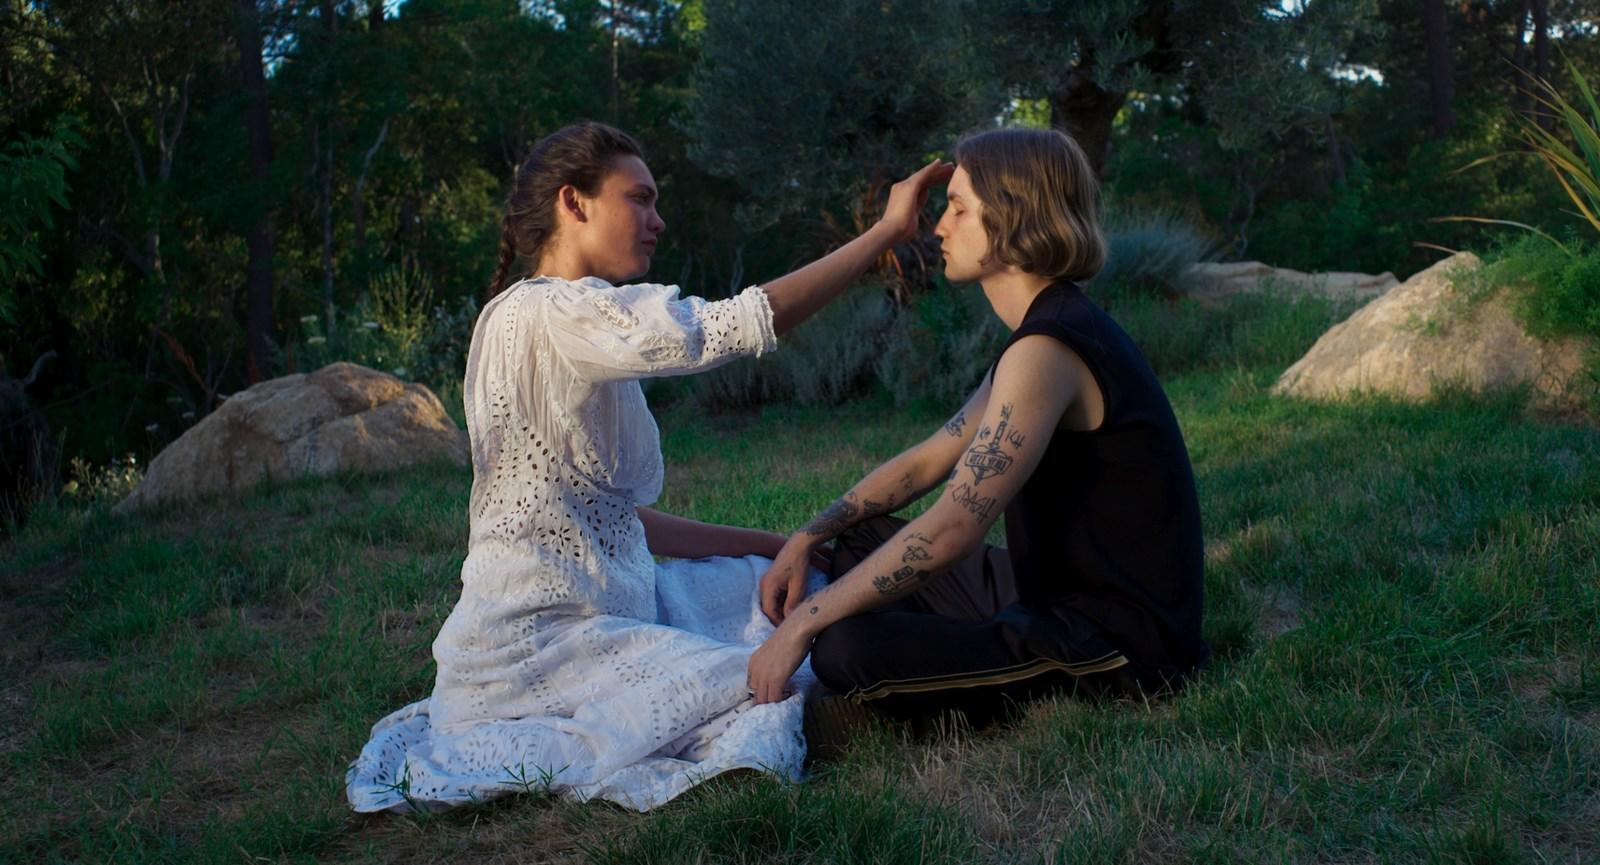 Jessica Forever, un film de Jonathan Vinel et Caroline Poggi